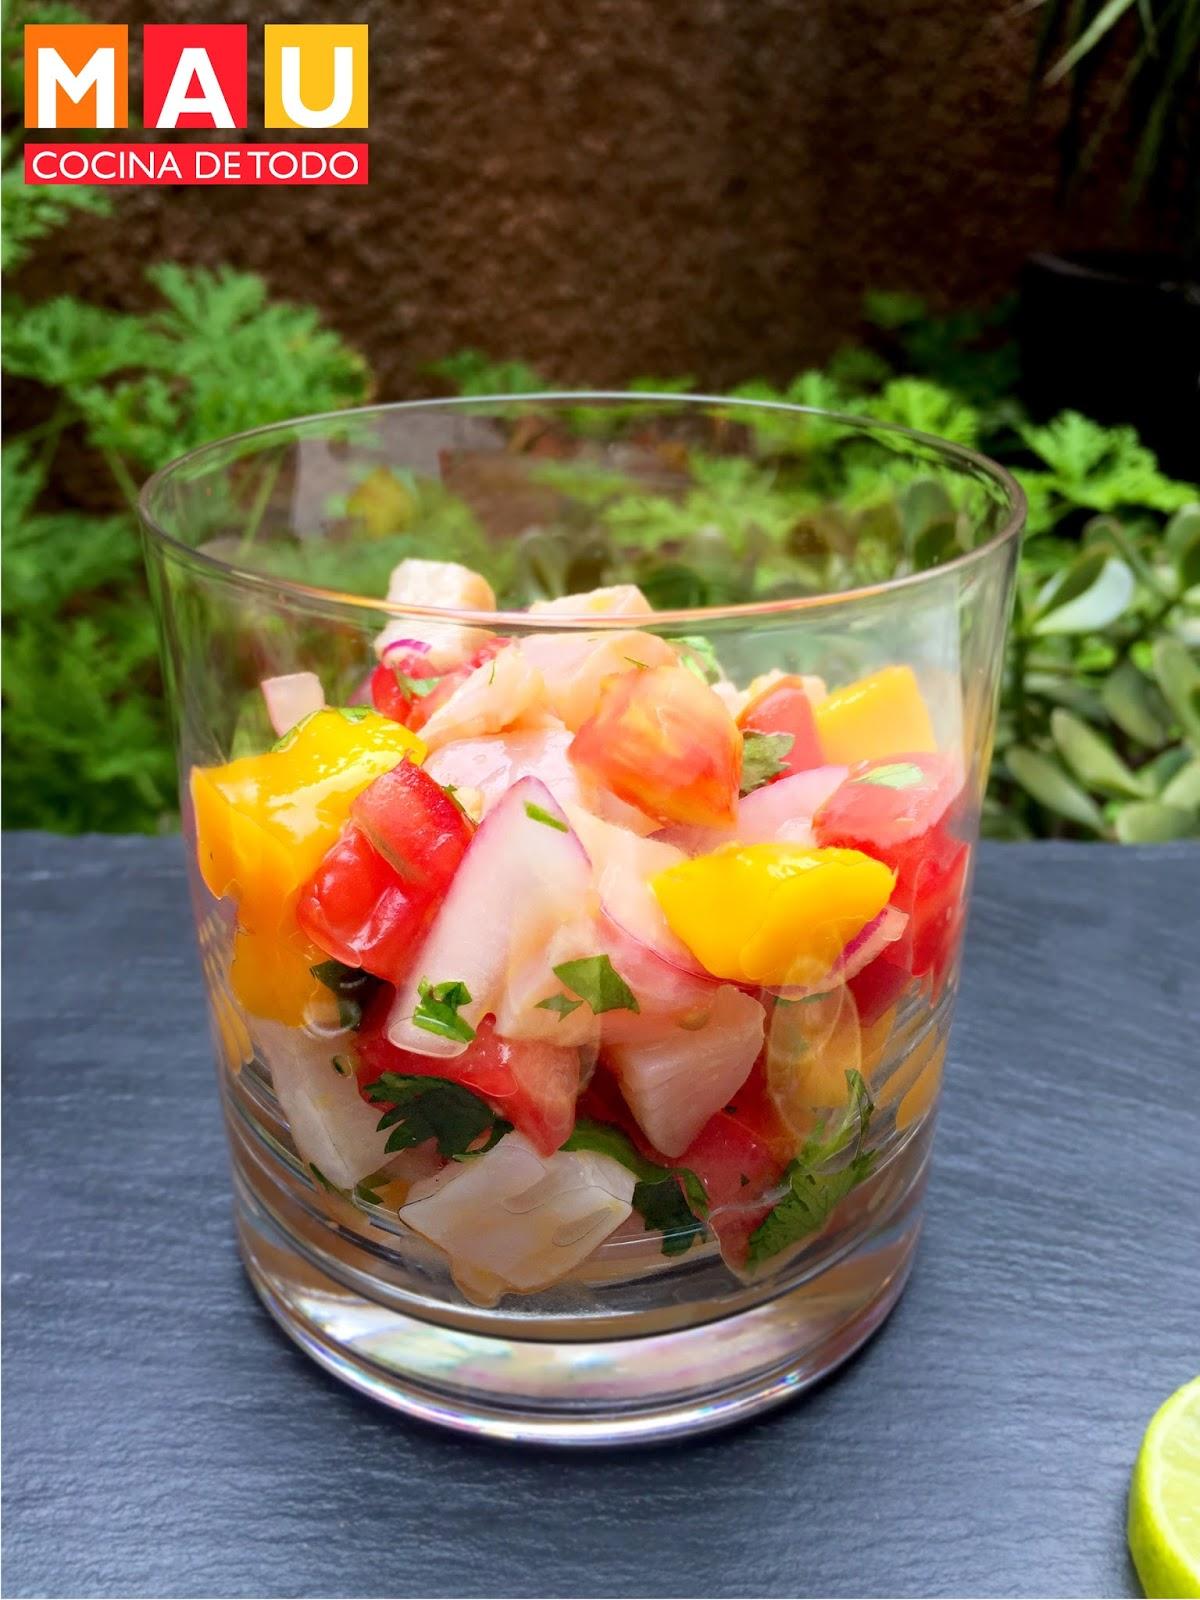 Mau cocina de todo ceviche de pescado con mango for Todo para la cocina